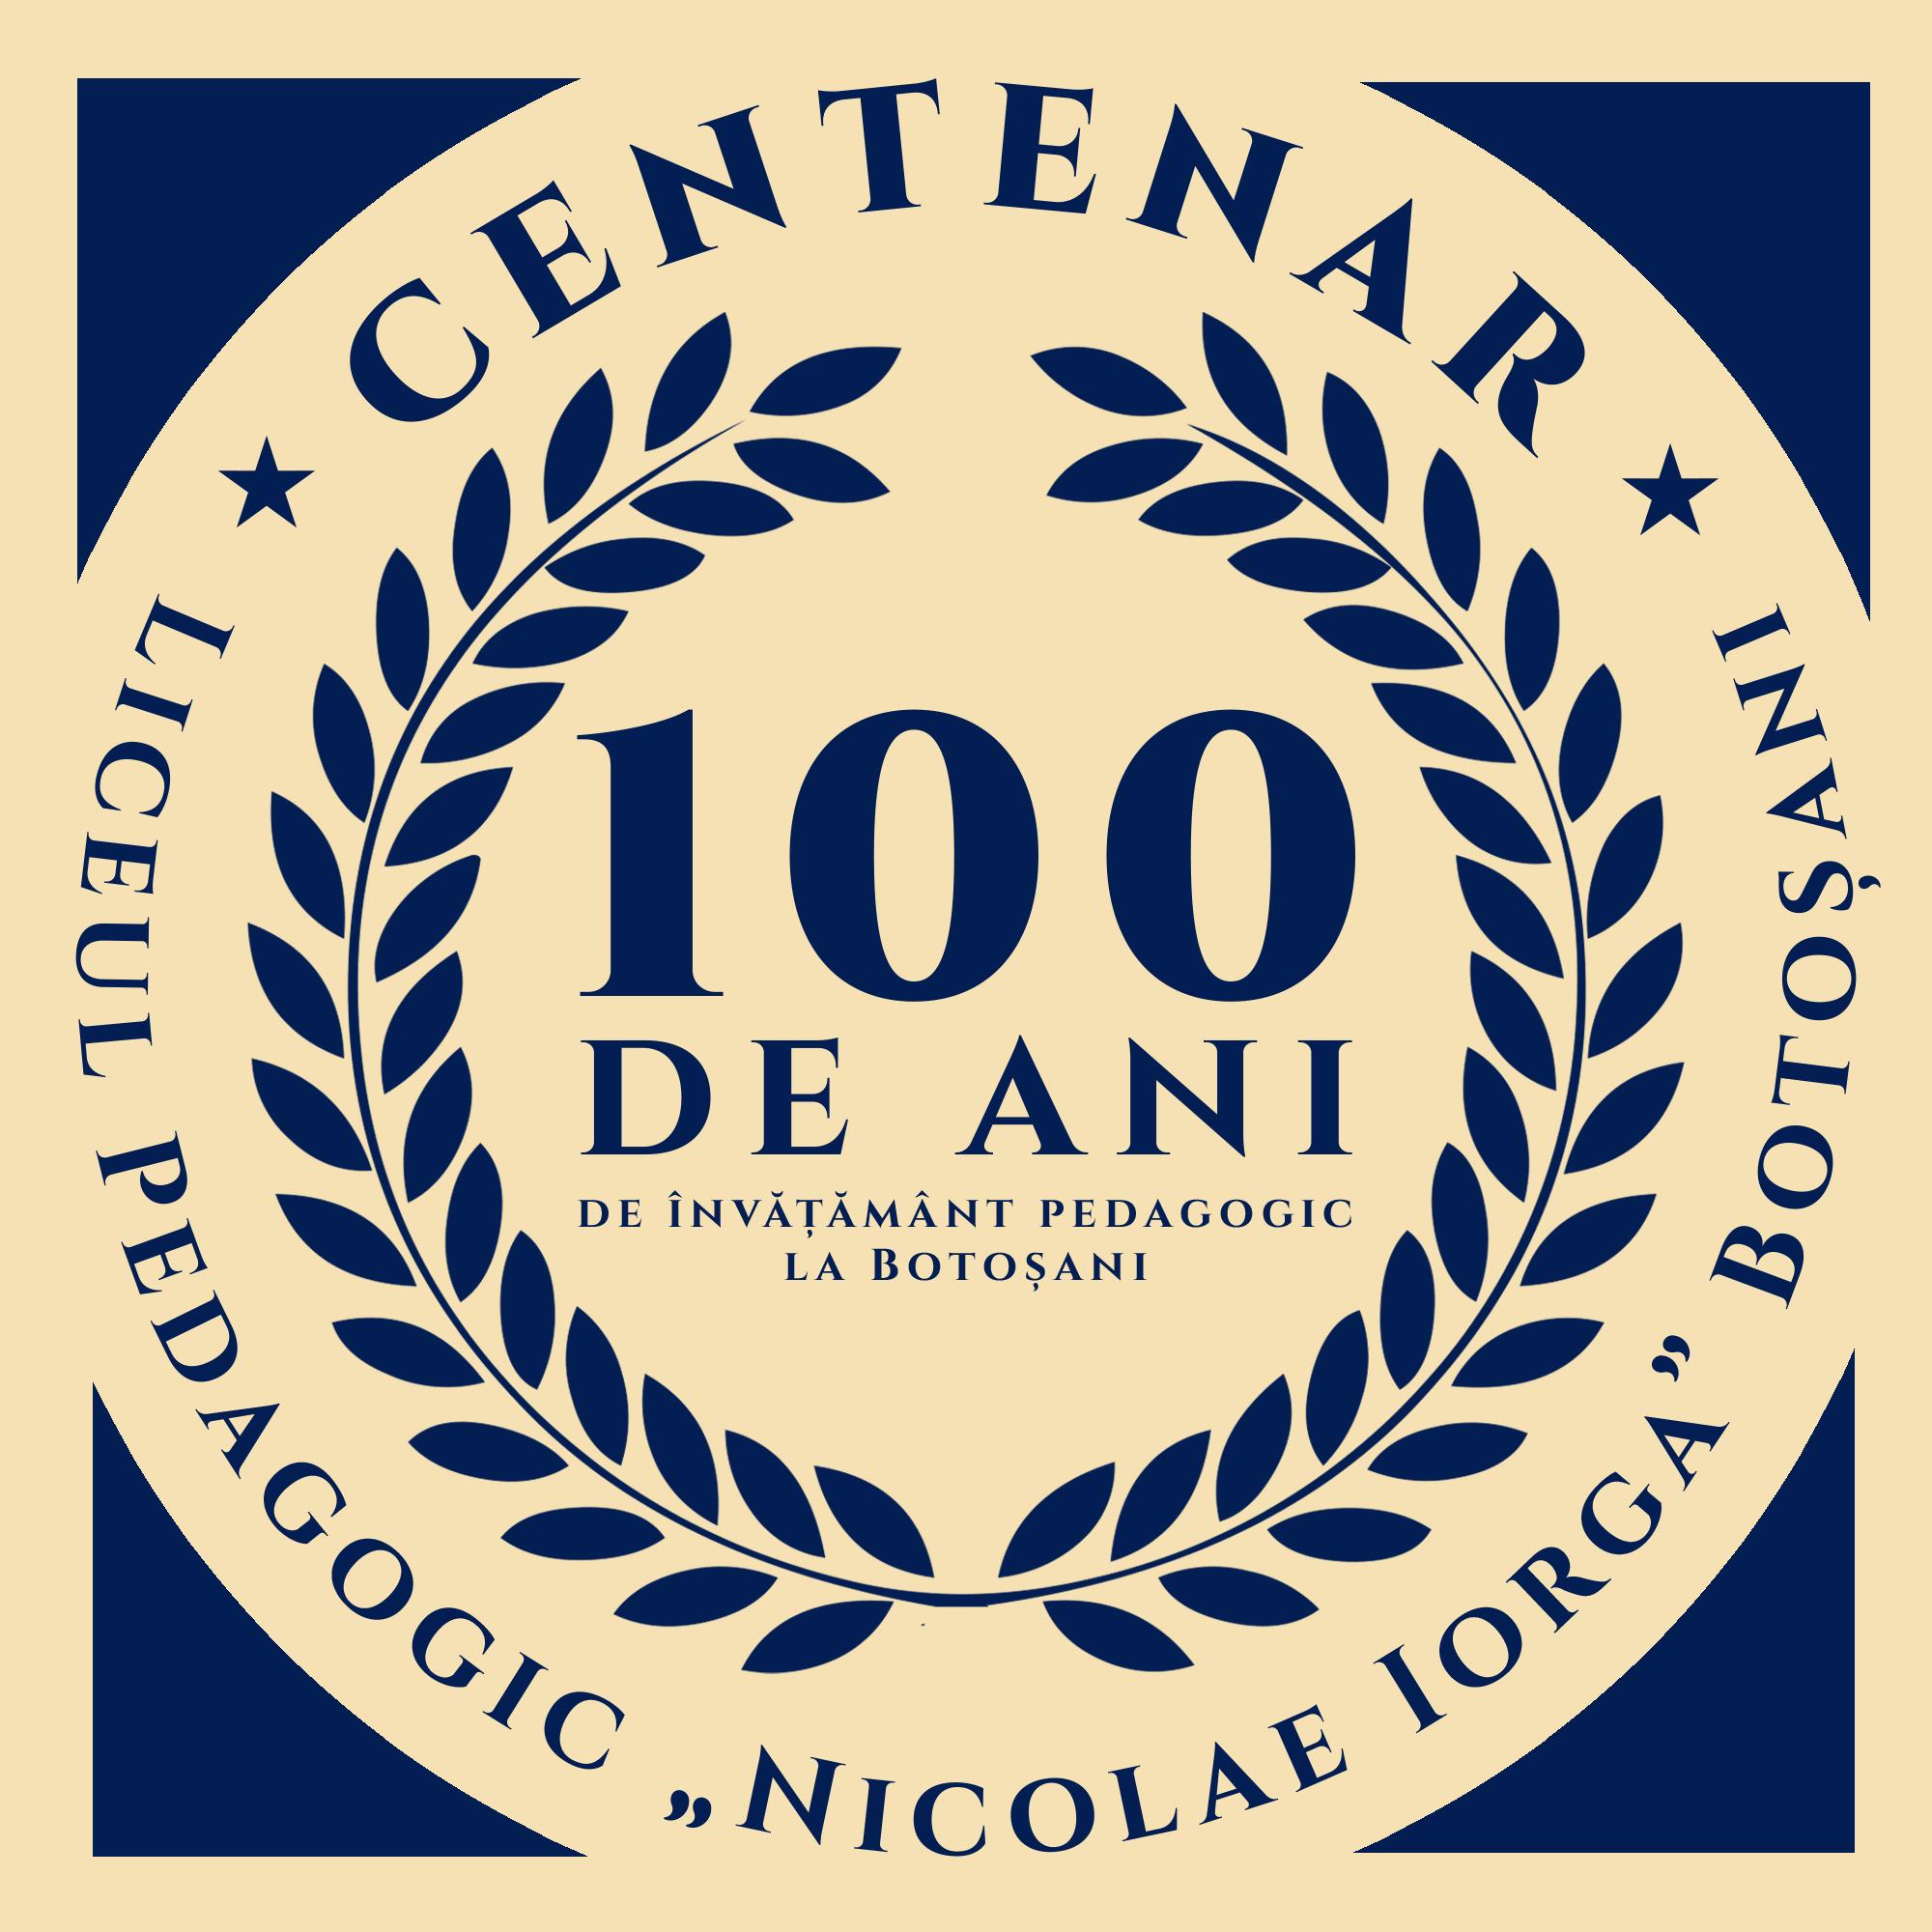 centenar